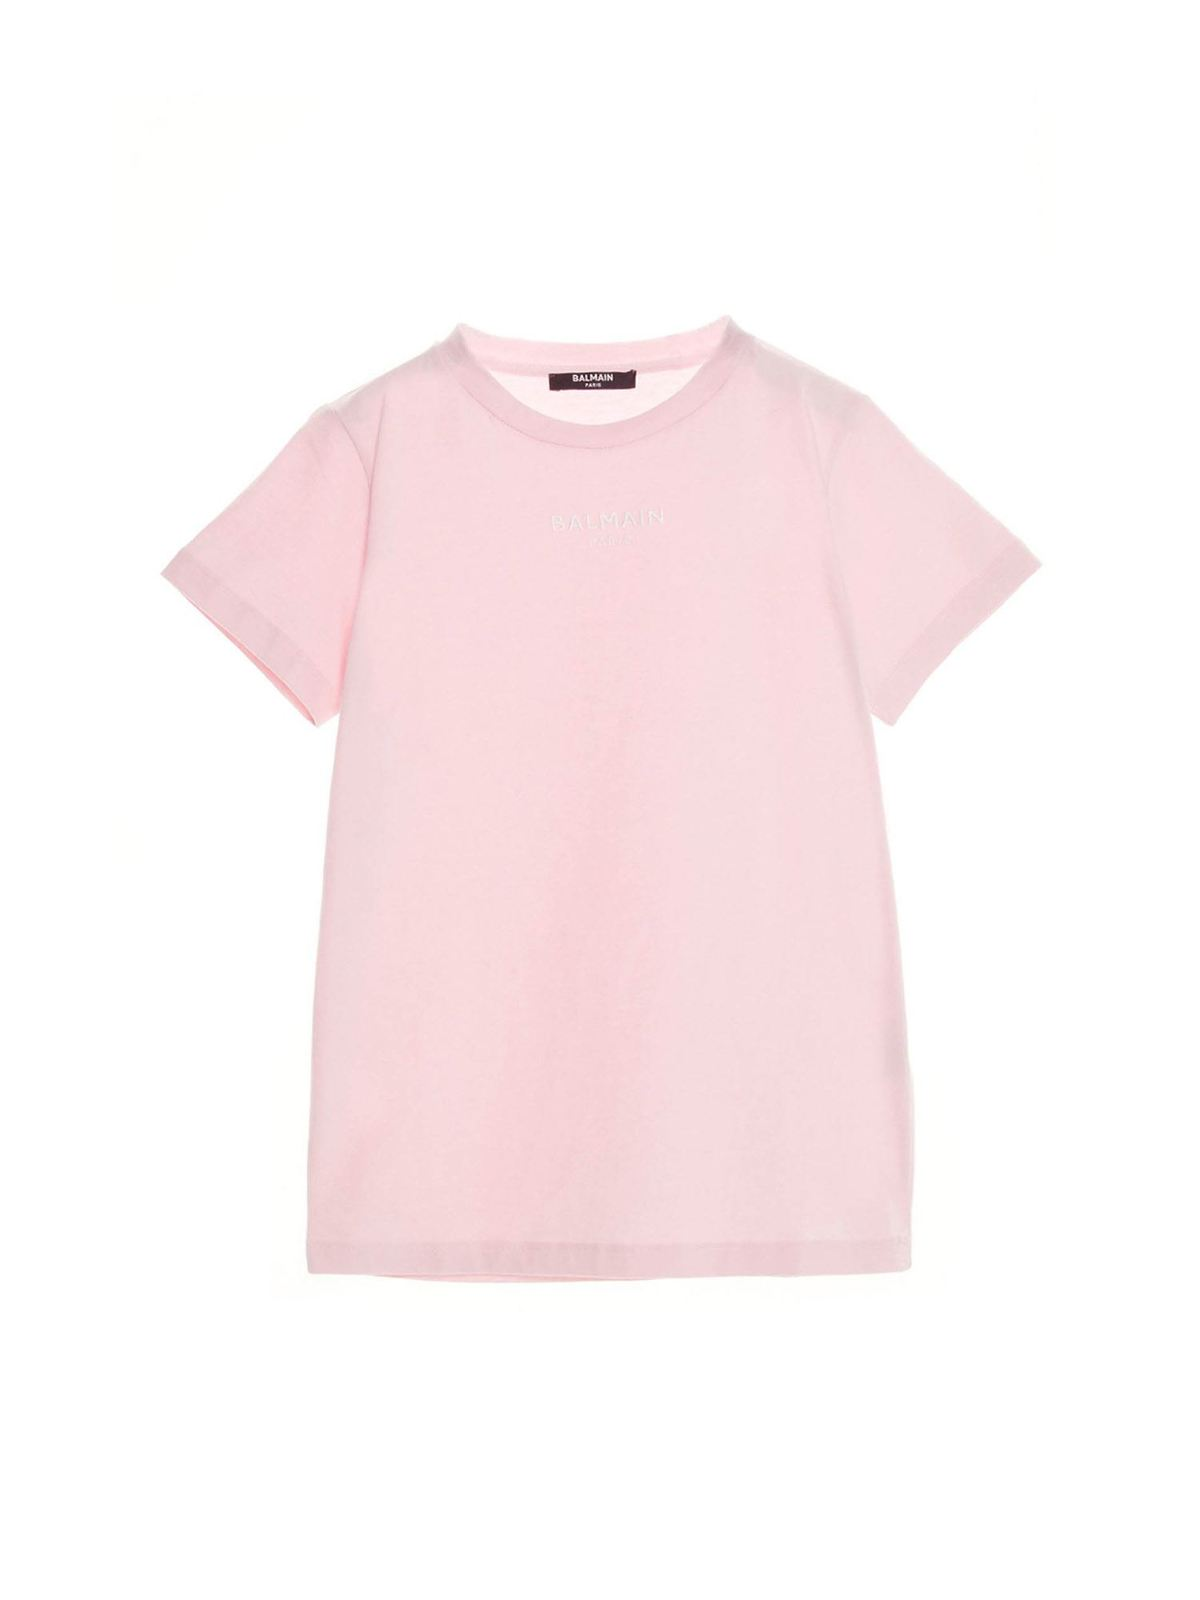 Balmain LOGO T-SHIRT IN PINK